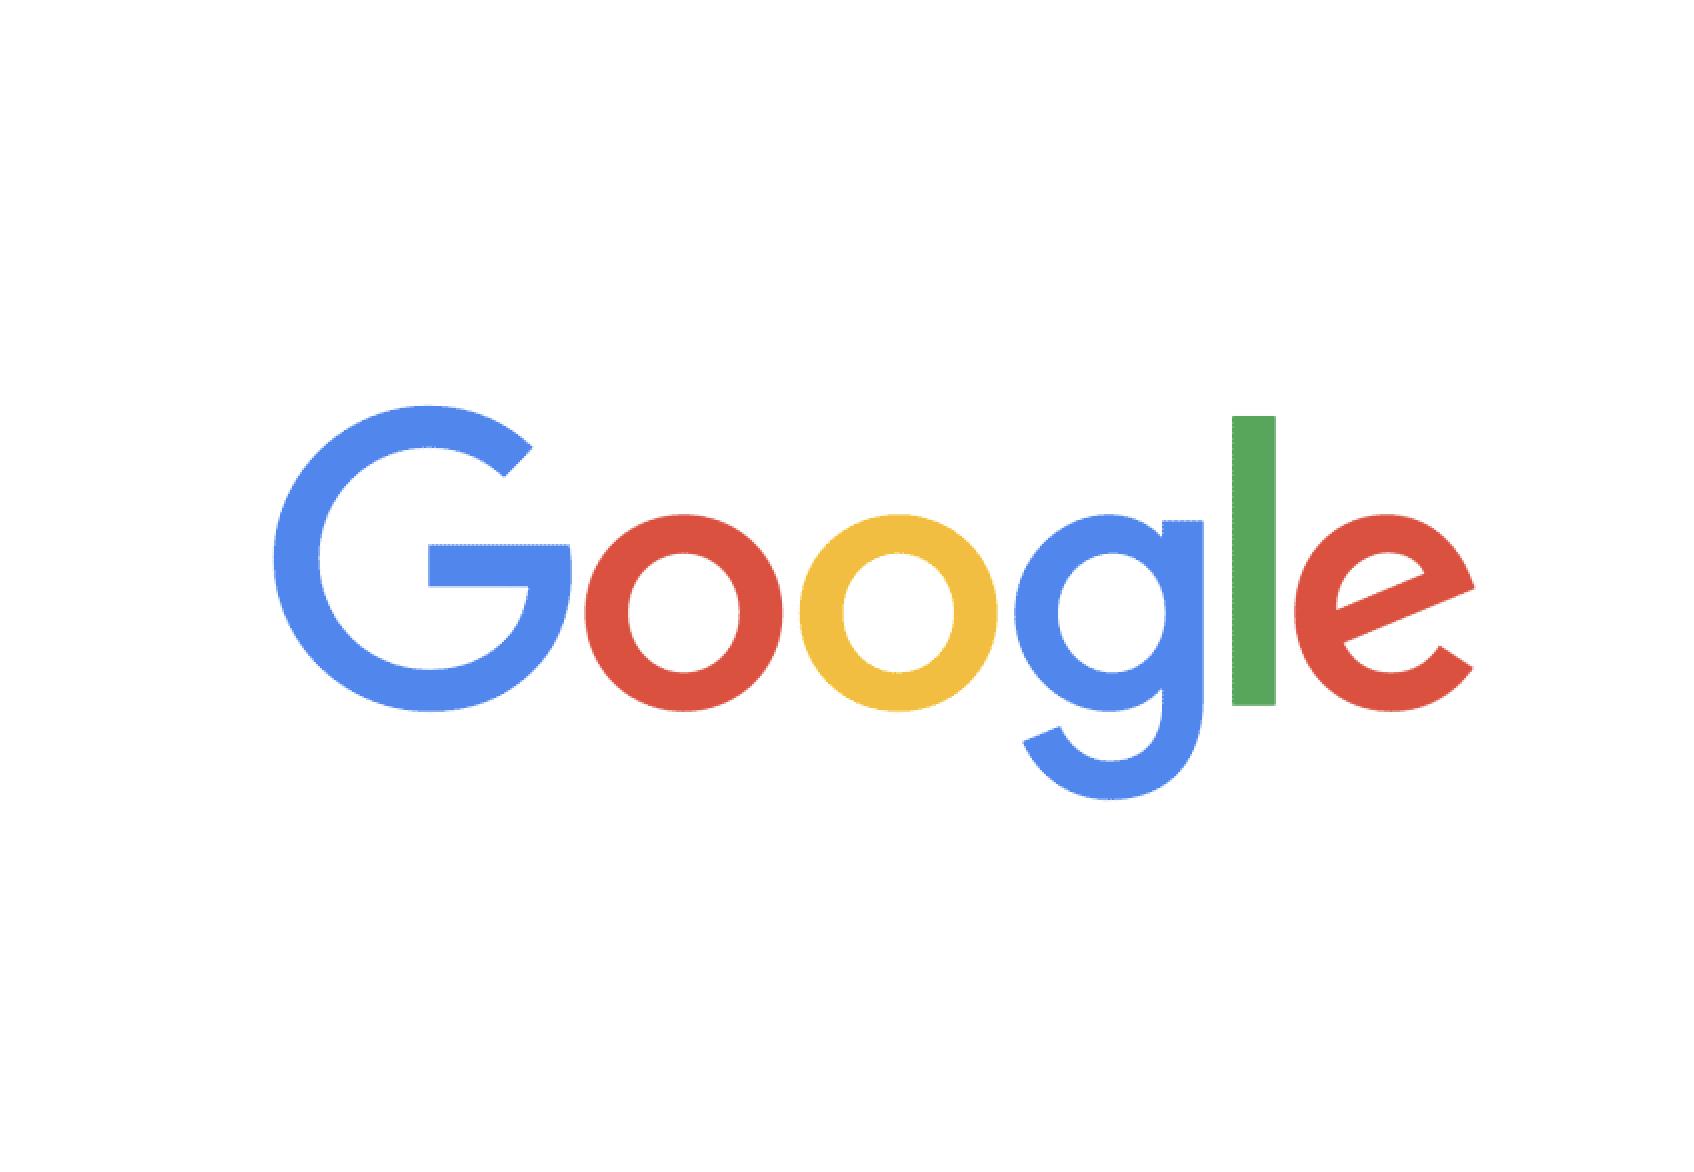 99c Movie Rental Google Play Movies through Google One (YMMV)